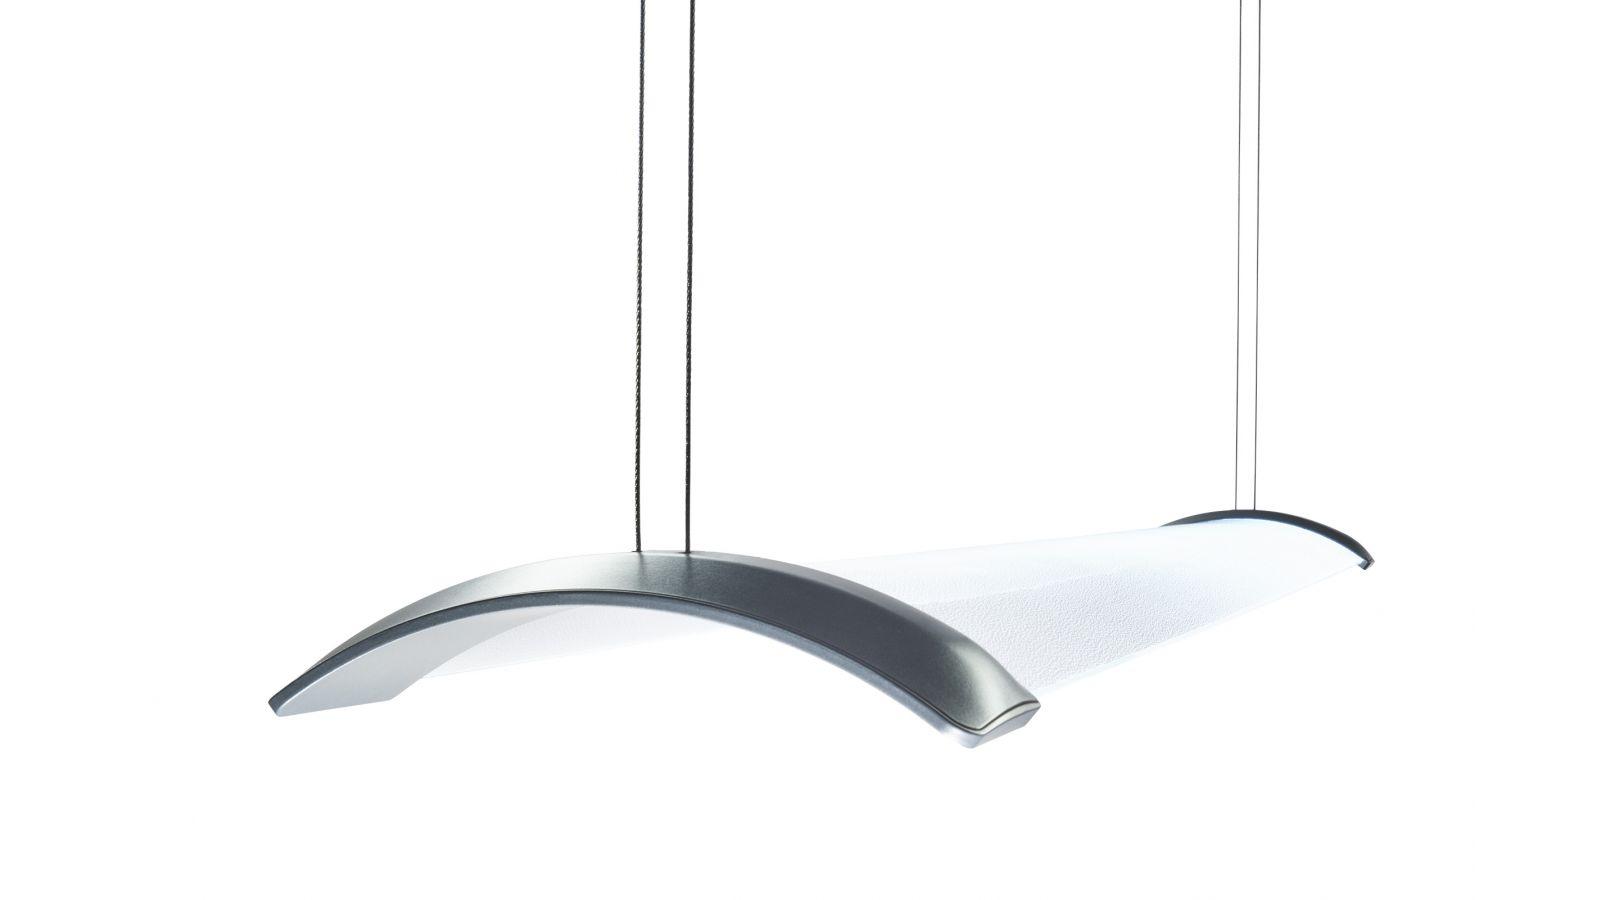 Neo-Ray Covera LED Direct/Indirect Luminaire